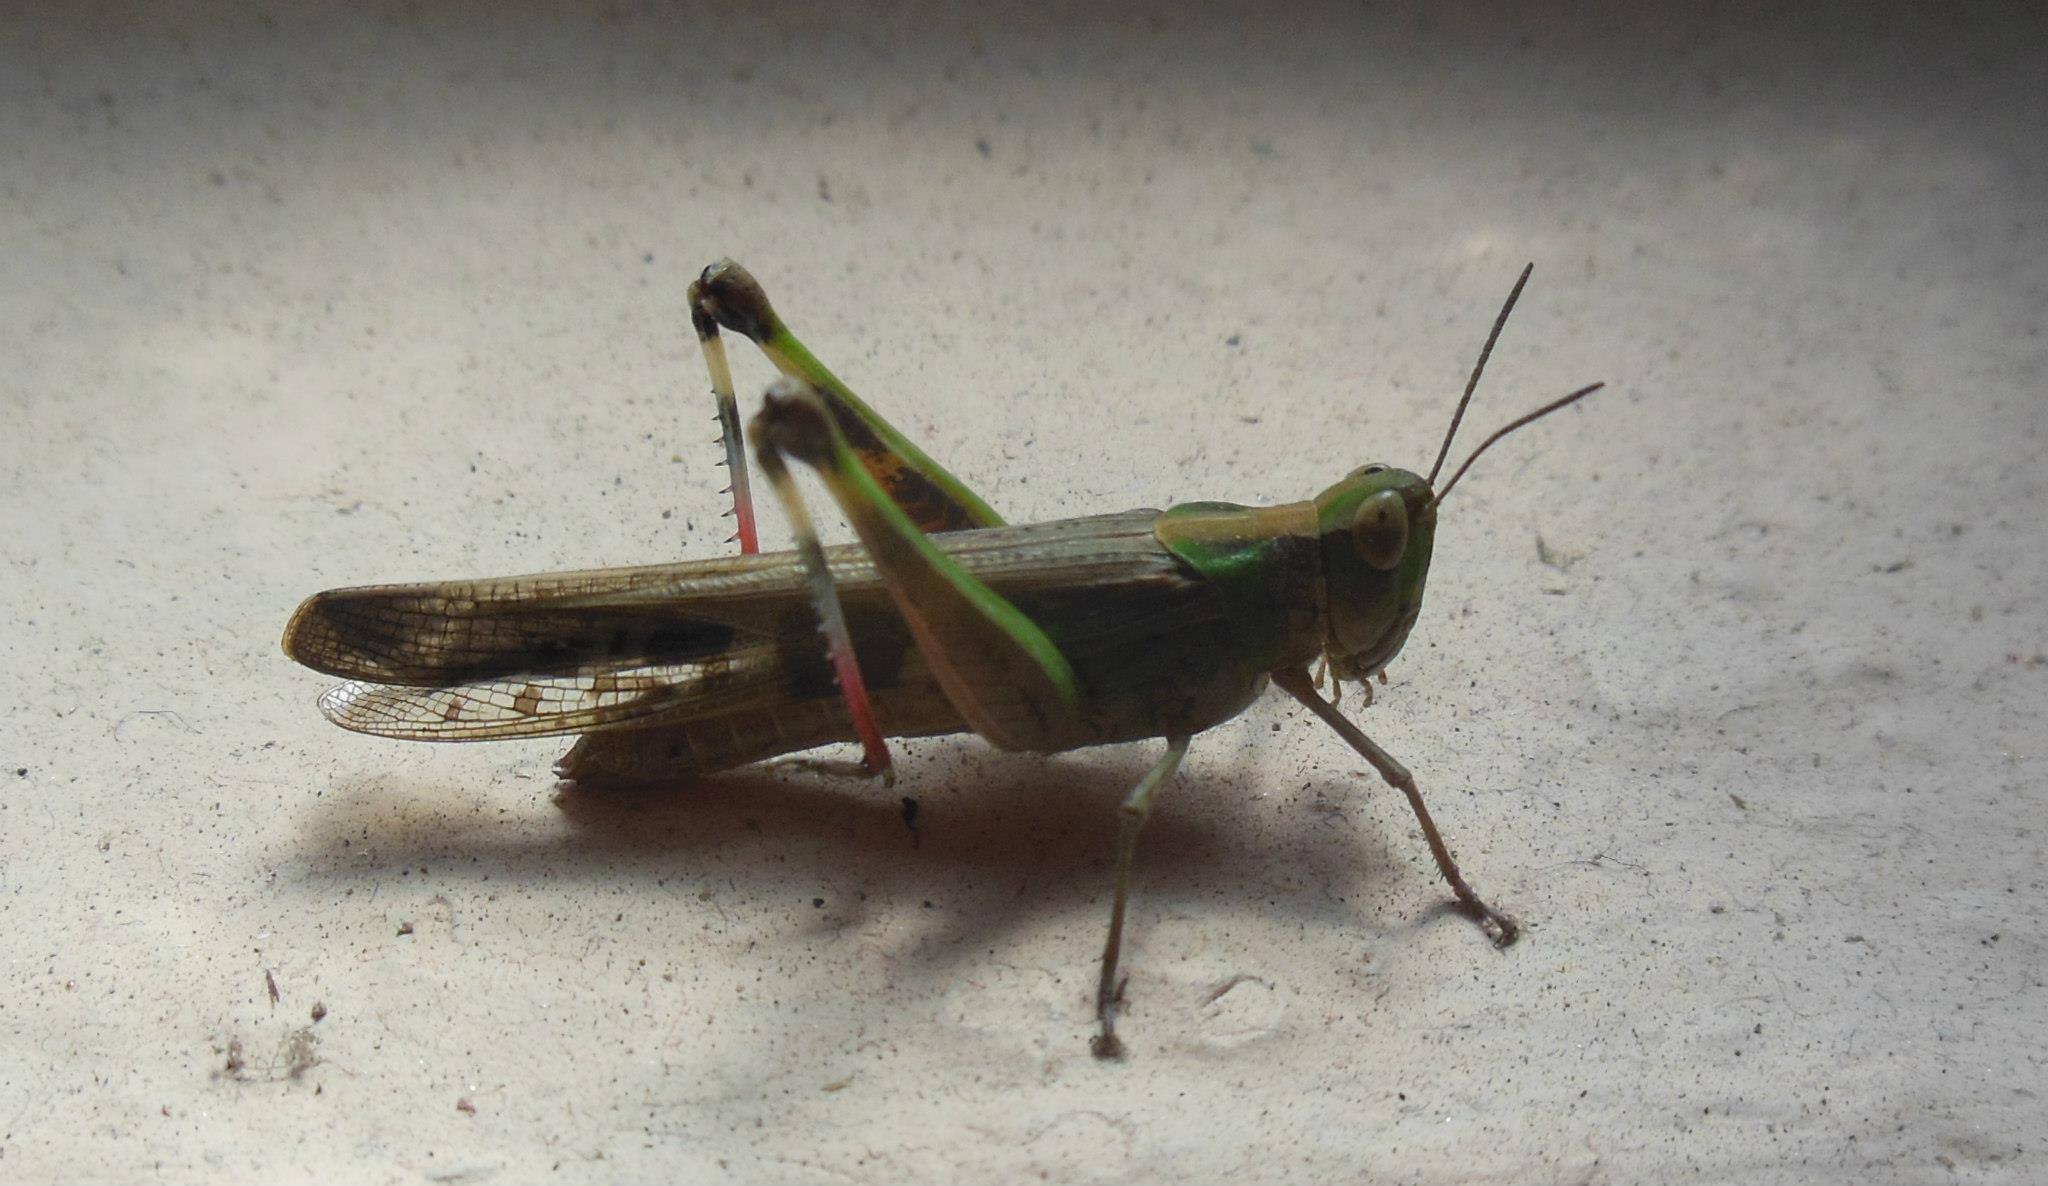 Grasshoppers - Wikiquote